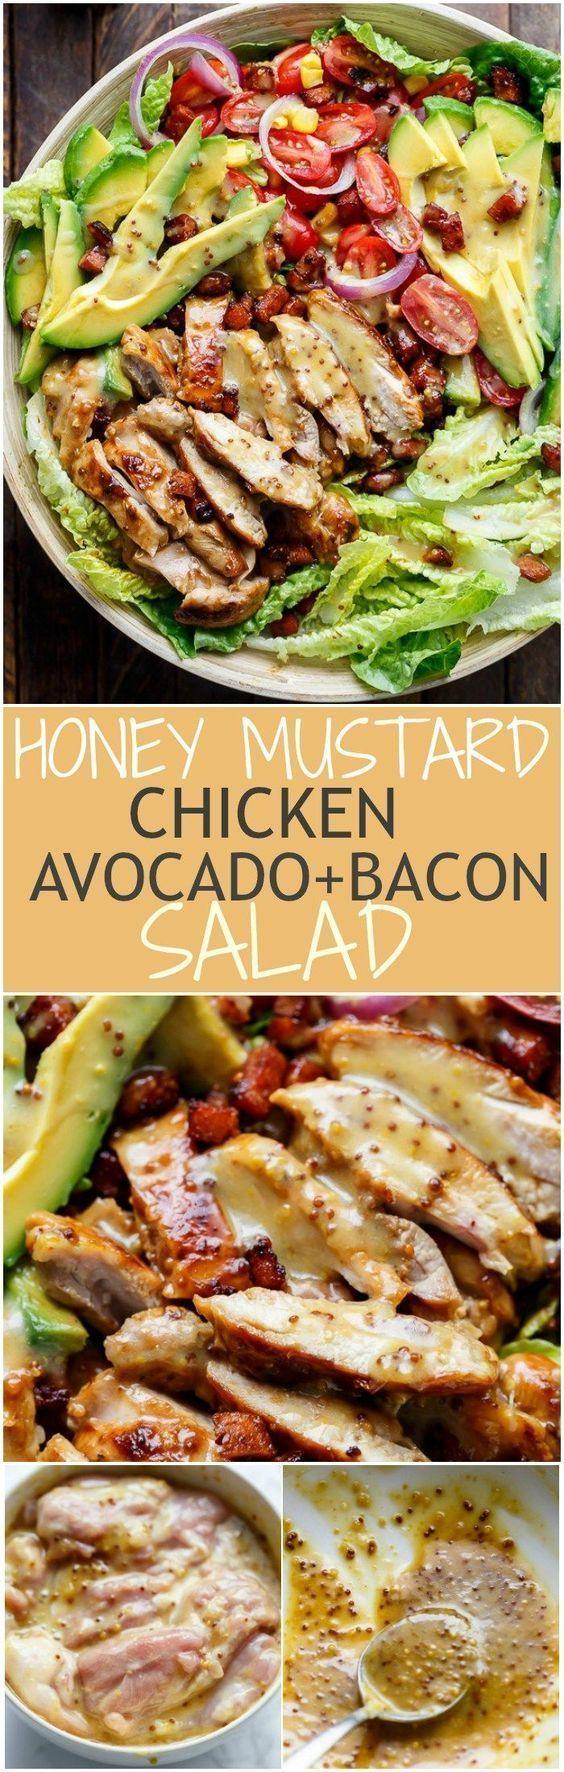 Clean Eating Honey Mustard Chicken, Avocado and Bacon Salad Recipe